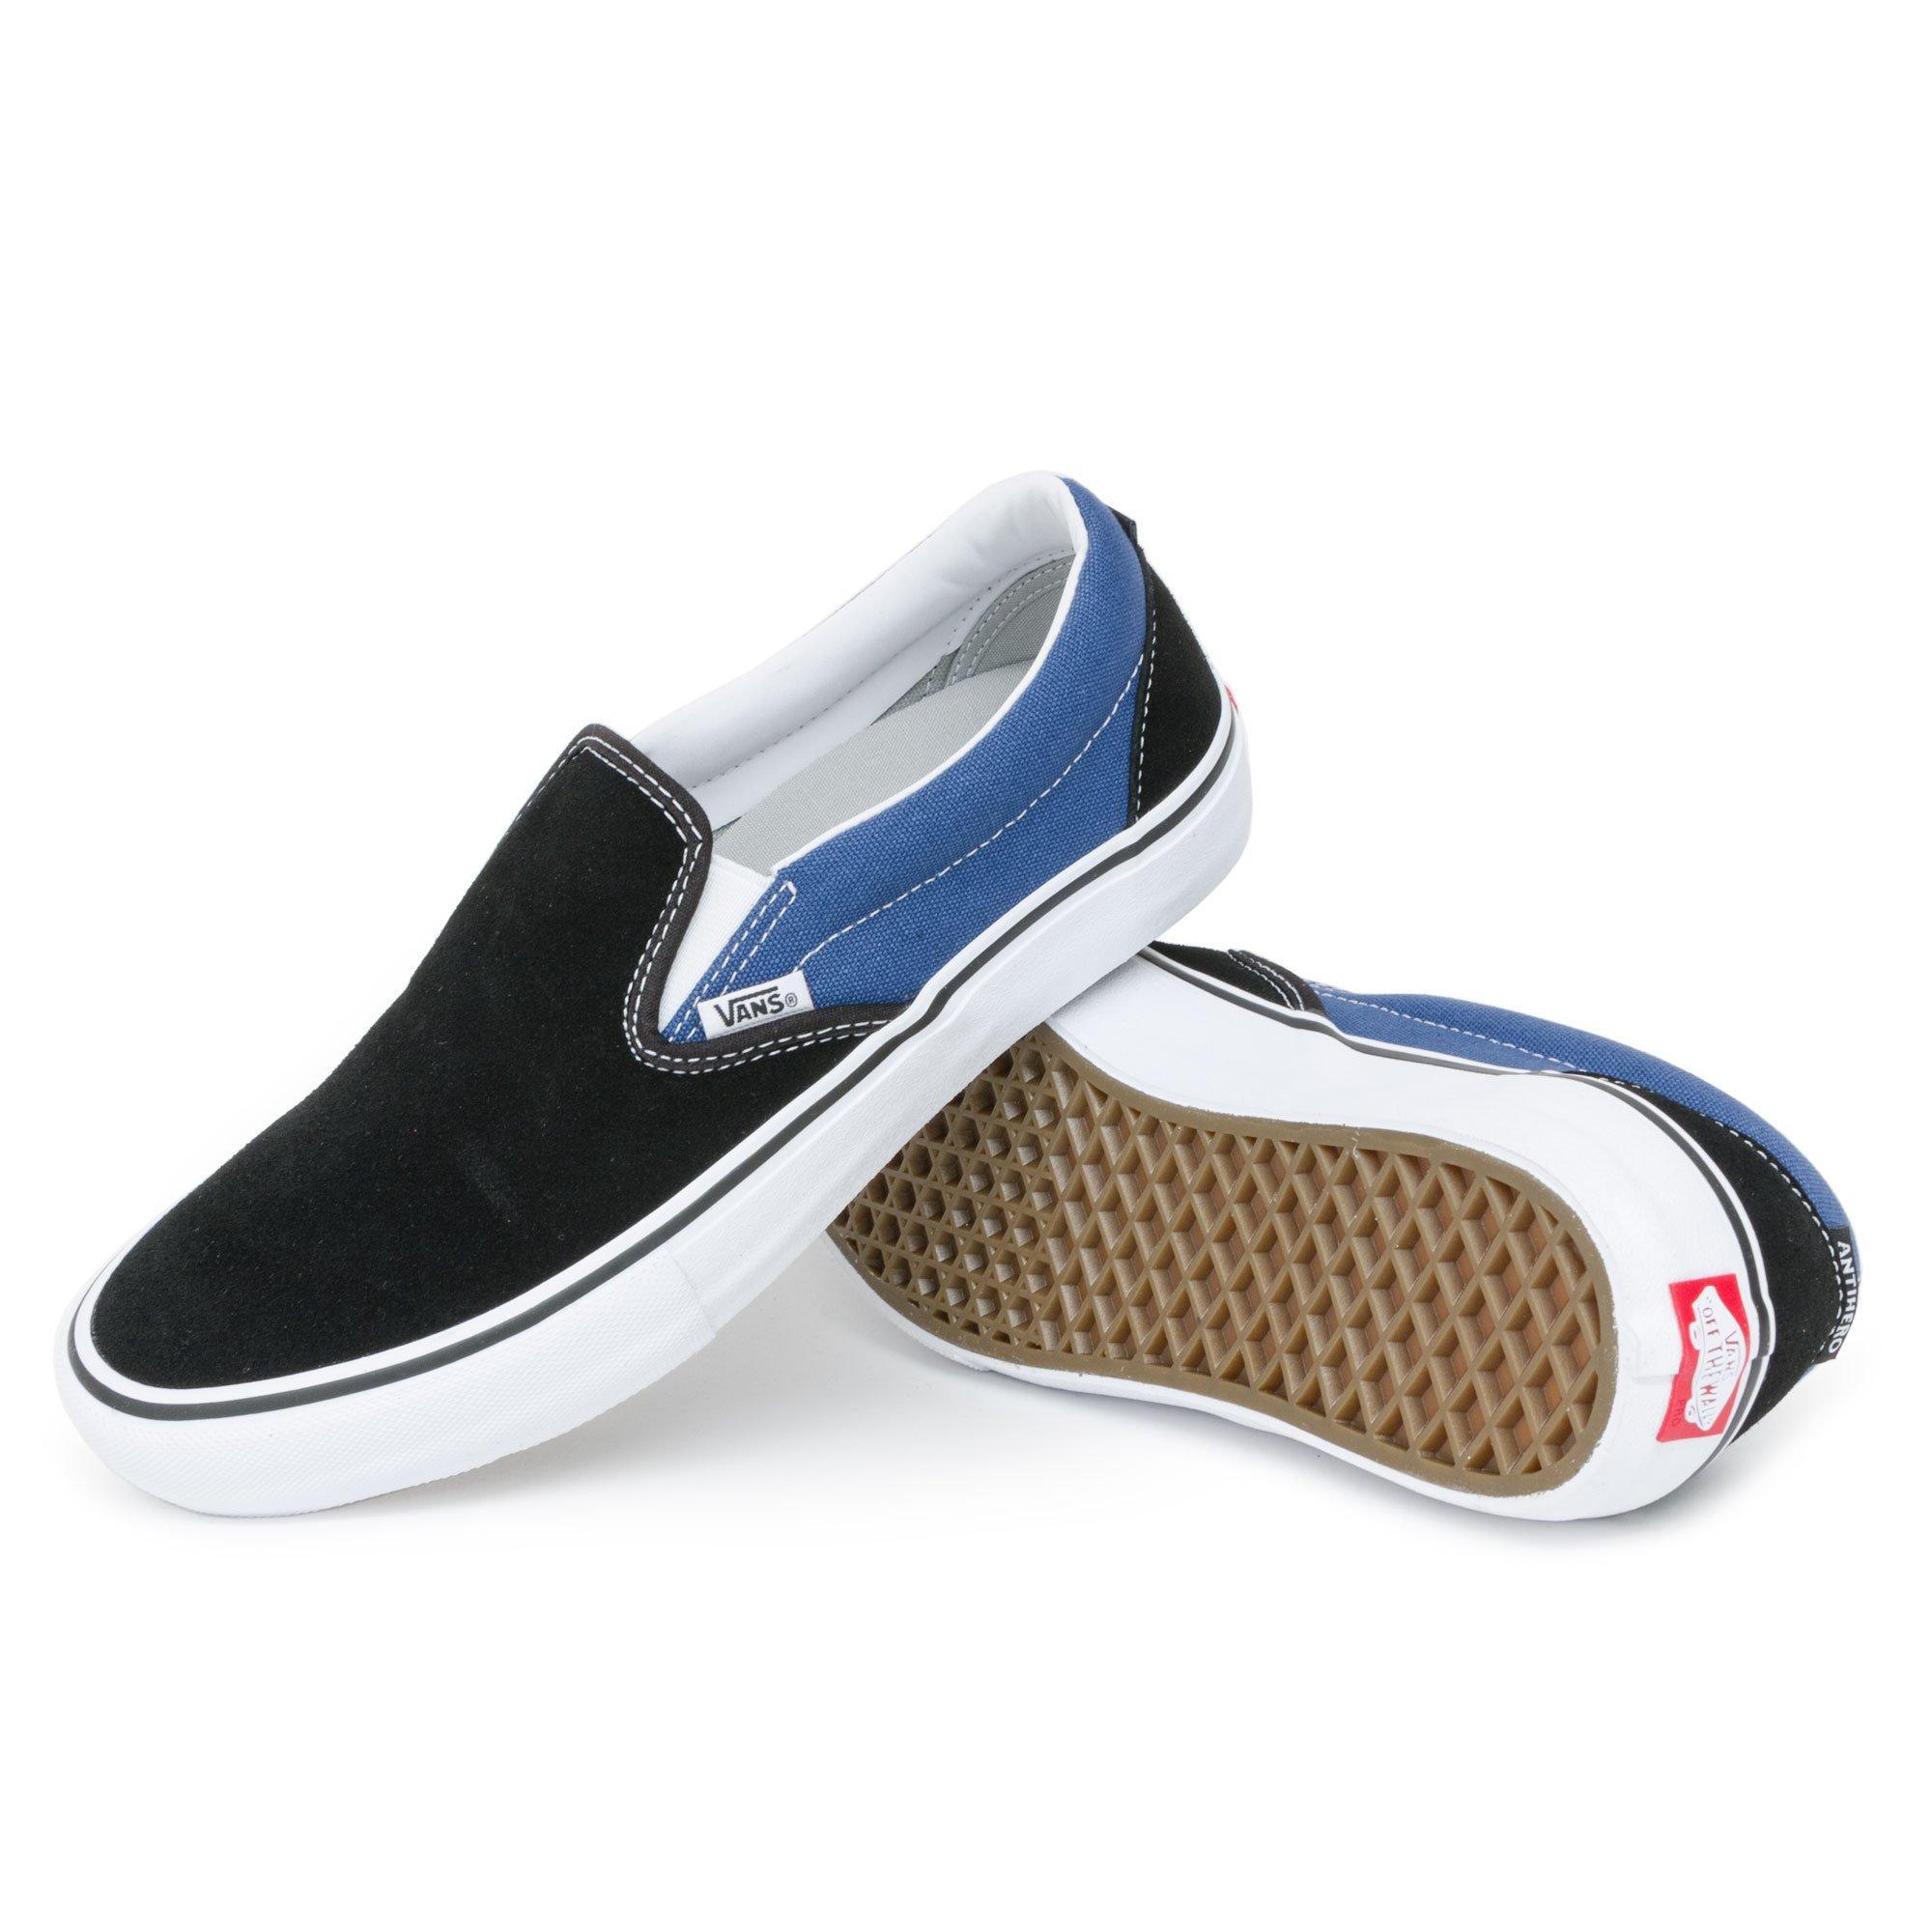 Vans X Antihero Slip On Pro Shoes in